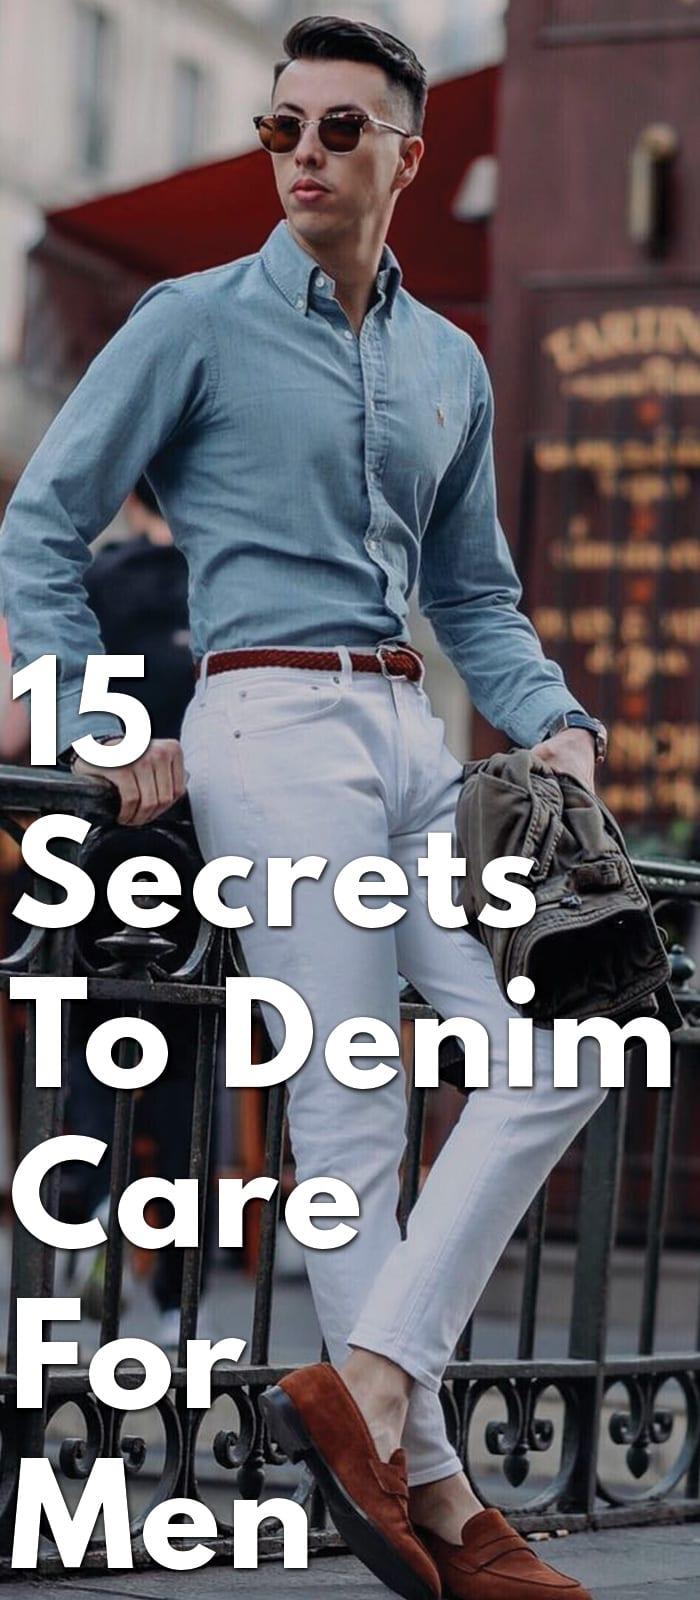 15-Secrets-To-Denim-Care-For-Men